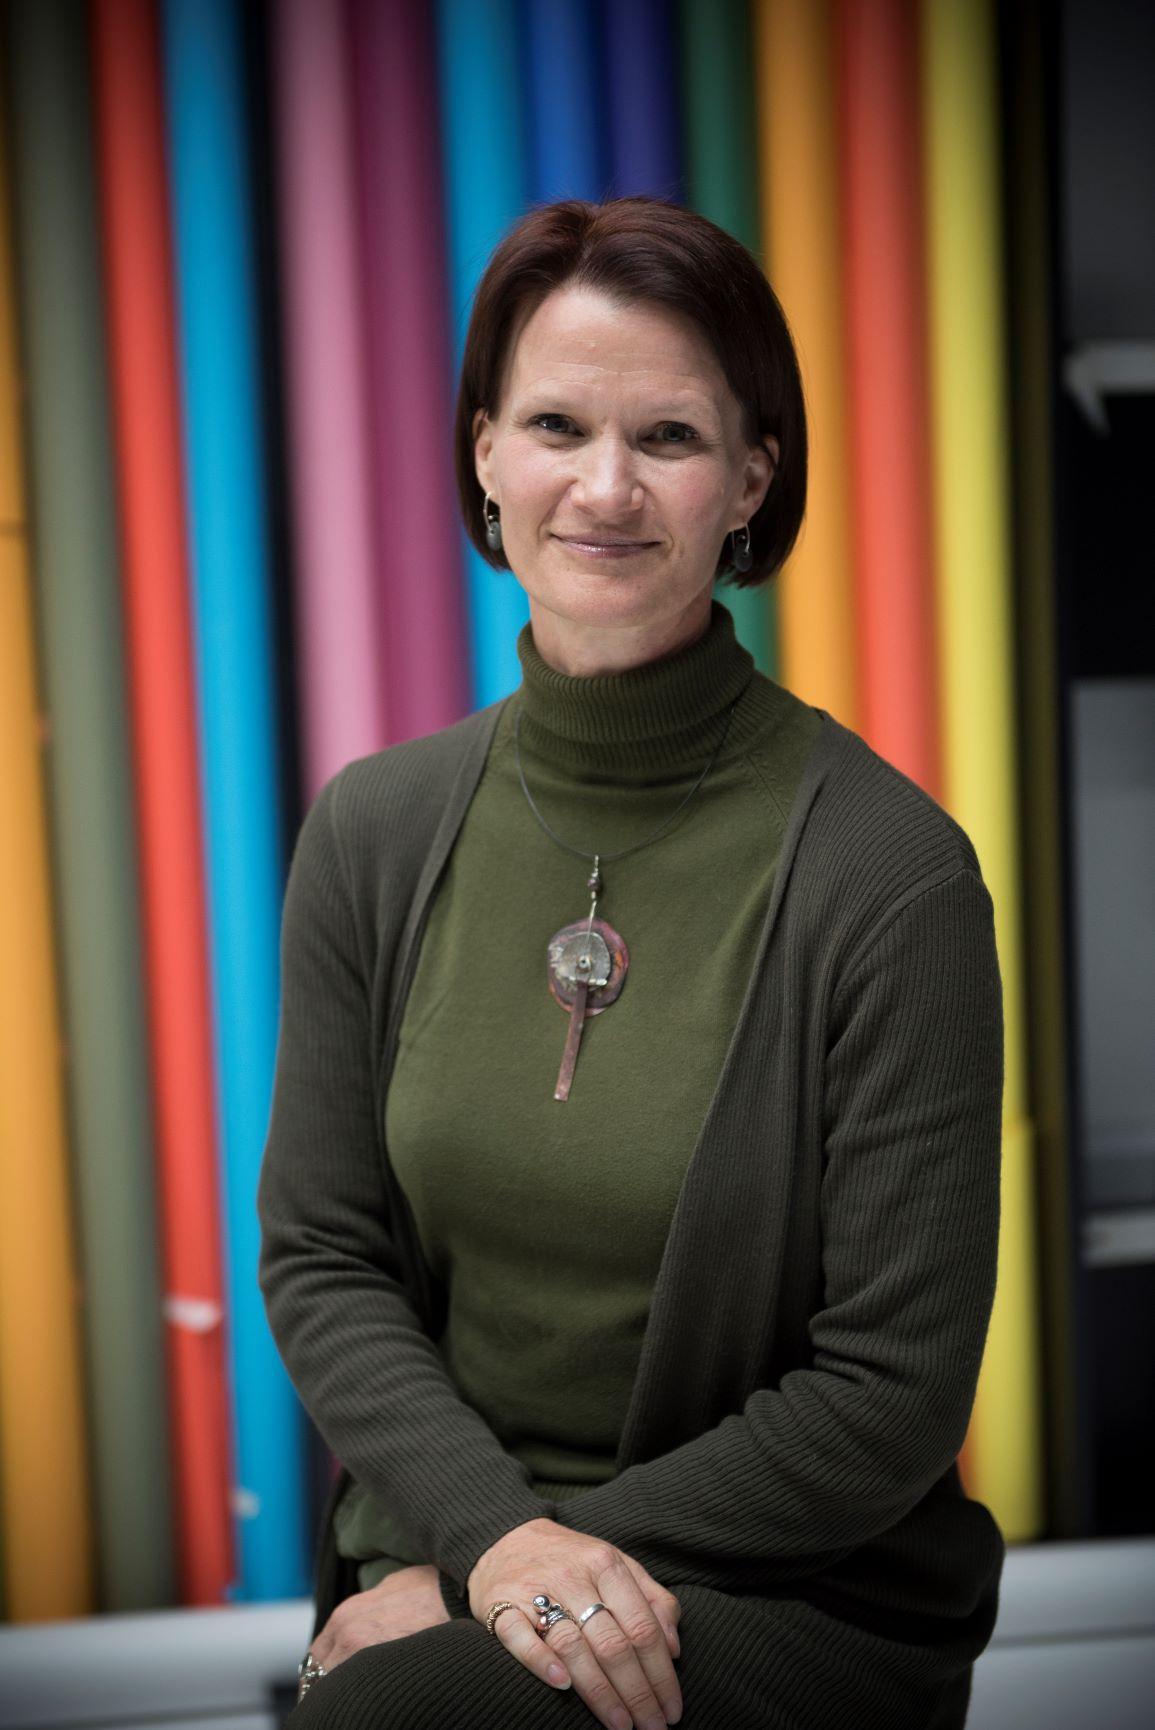 Profile picture of Vida Midgelow